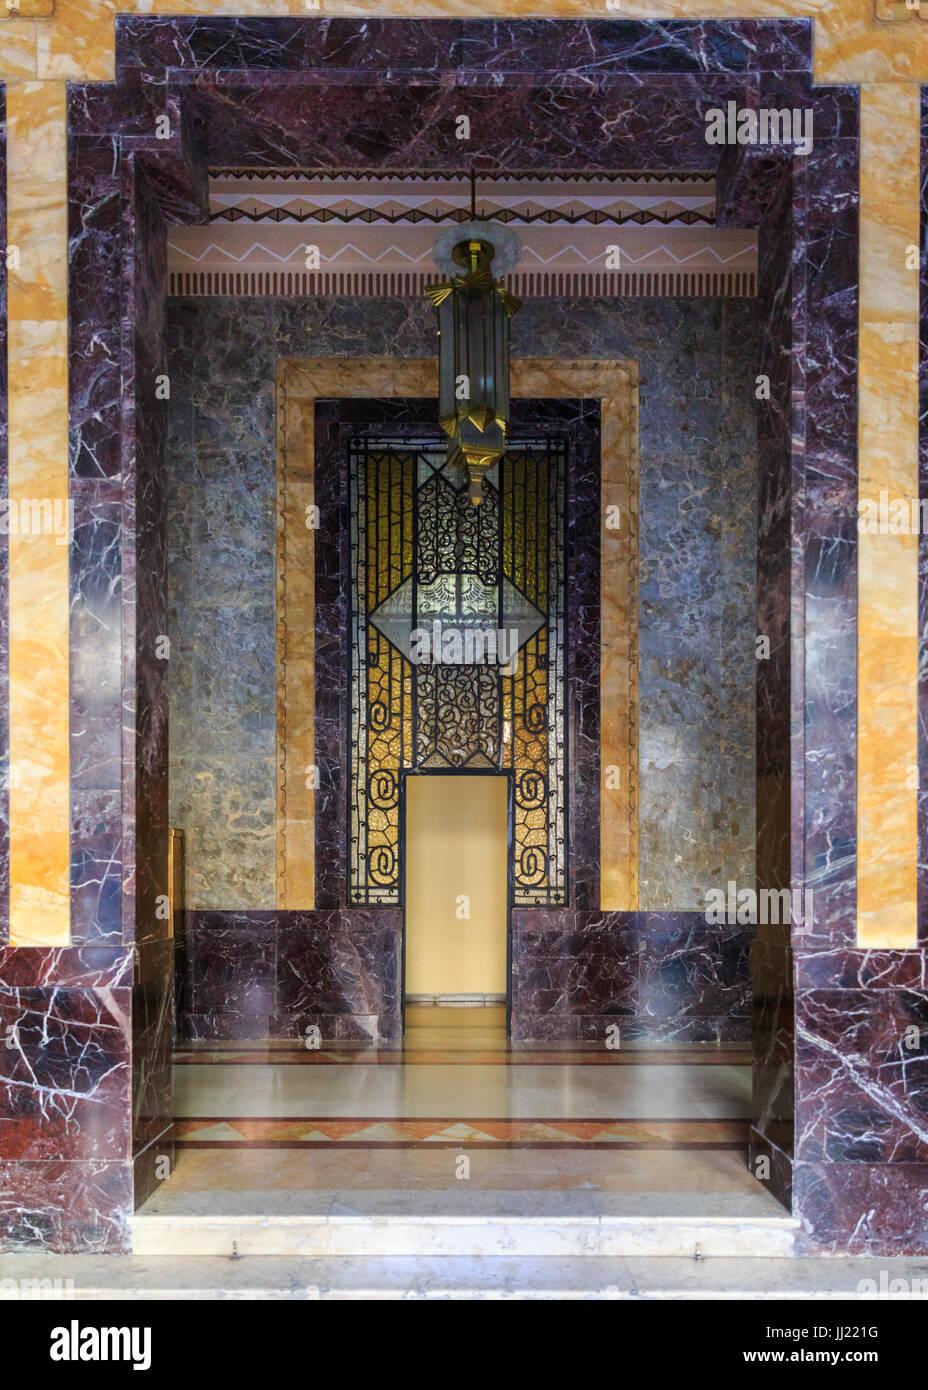 Aufbau von Bacardi, Edificio Bacardi, Interieur, Art-deco-Lobby ...